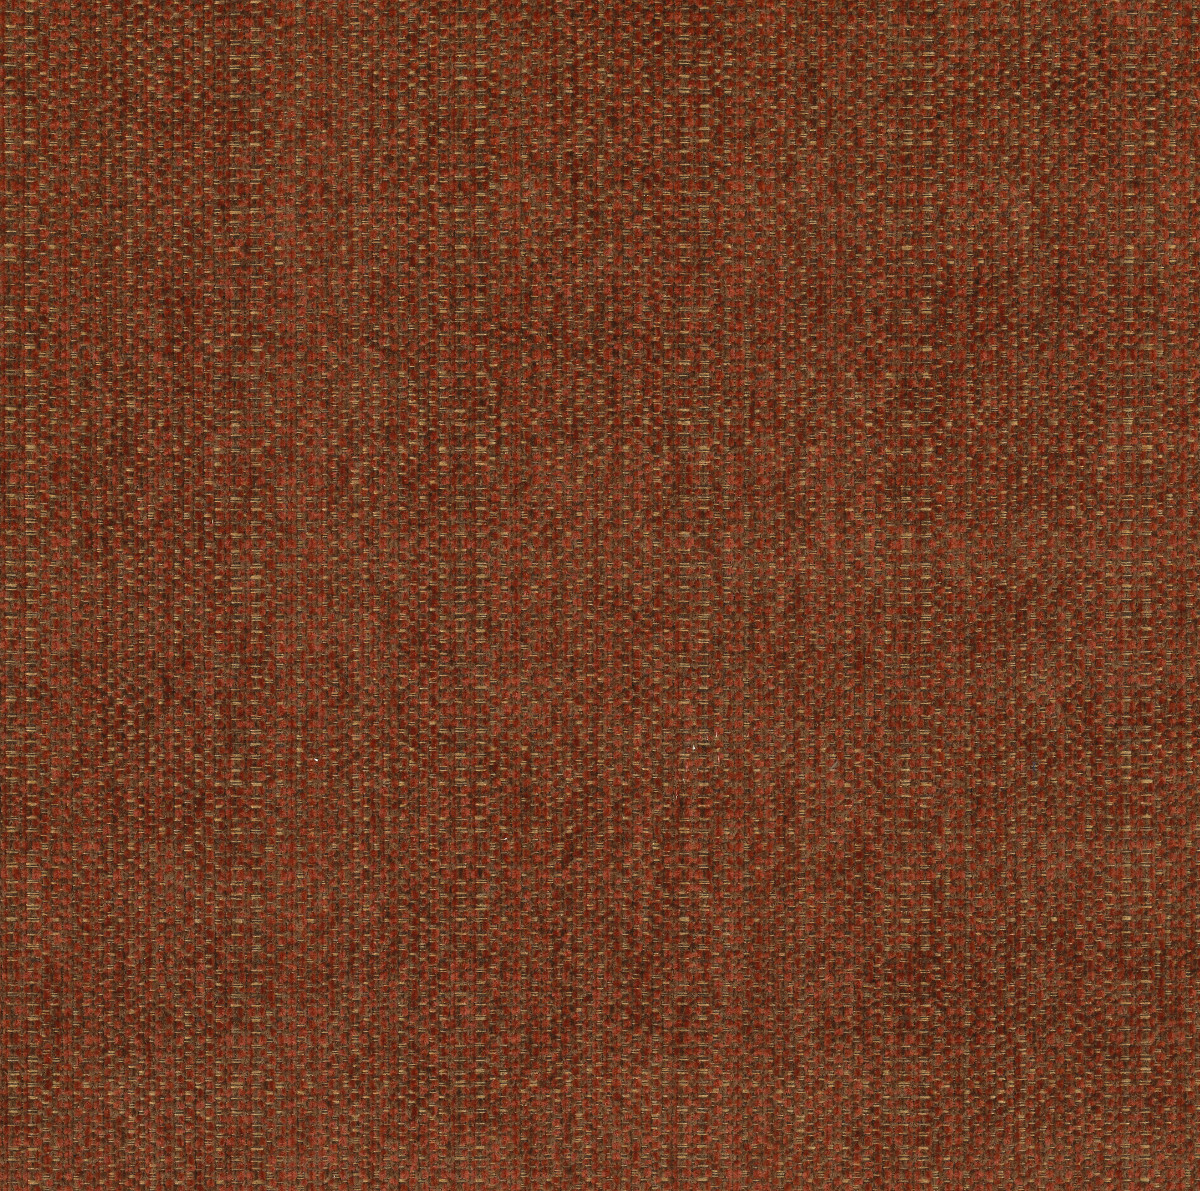 B133707